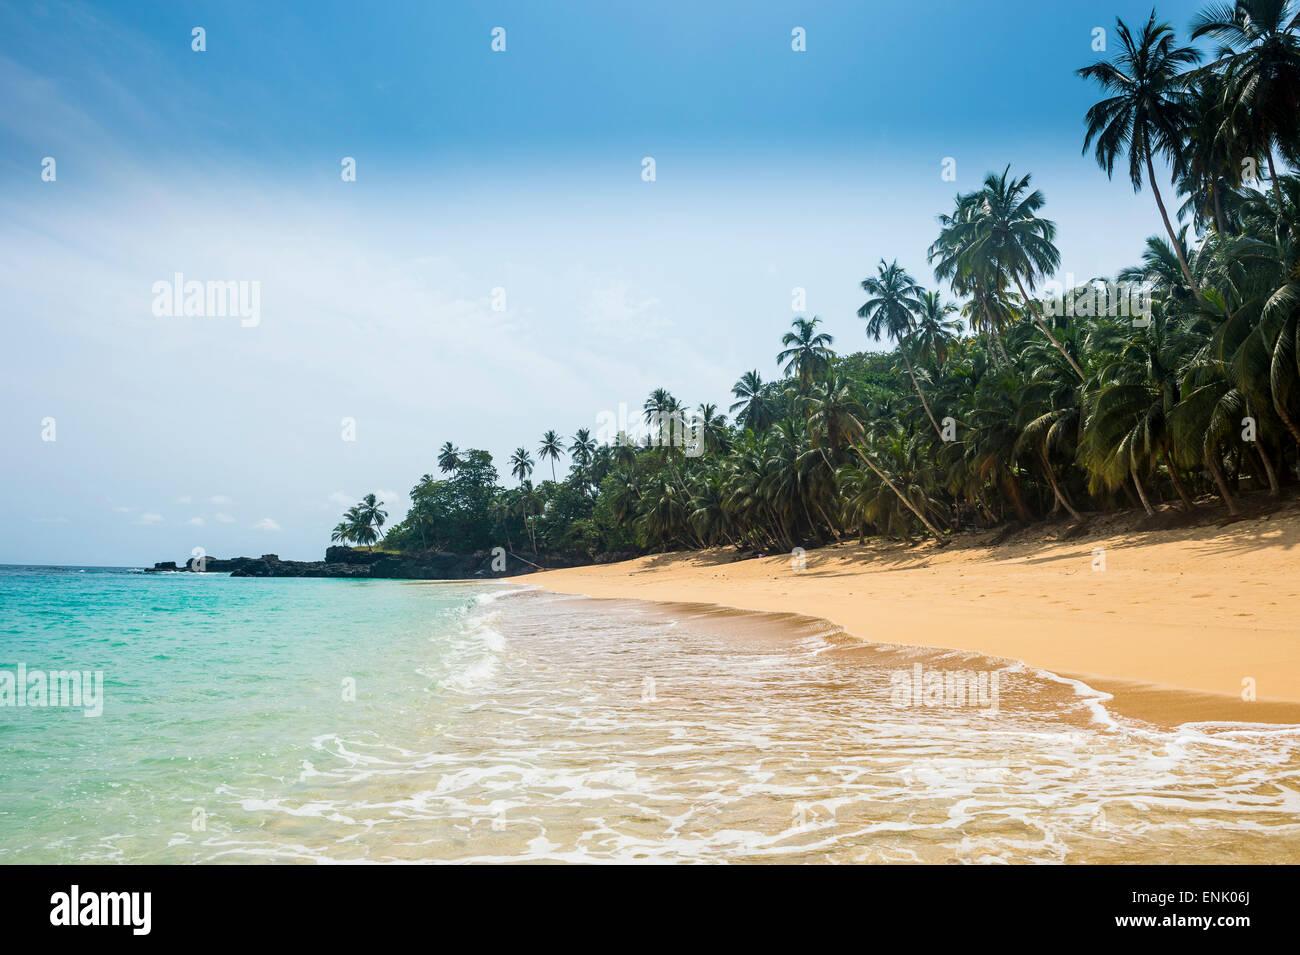 Abgelegenen tropischen Strand am UNESCO-Biosphärenreservat, Principe, Sao Tome und Principe, Atlantik, Afrika Stockbild